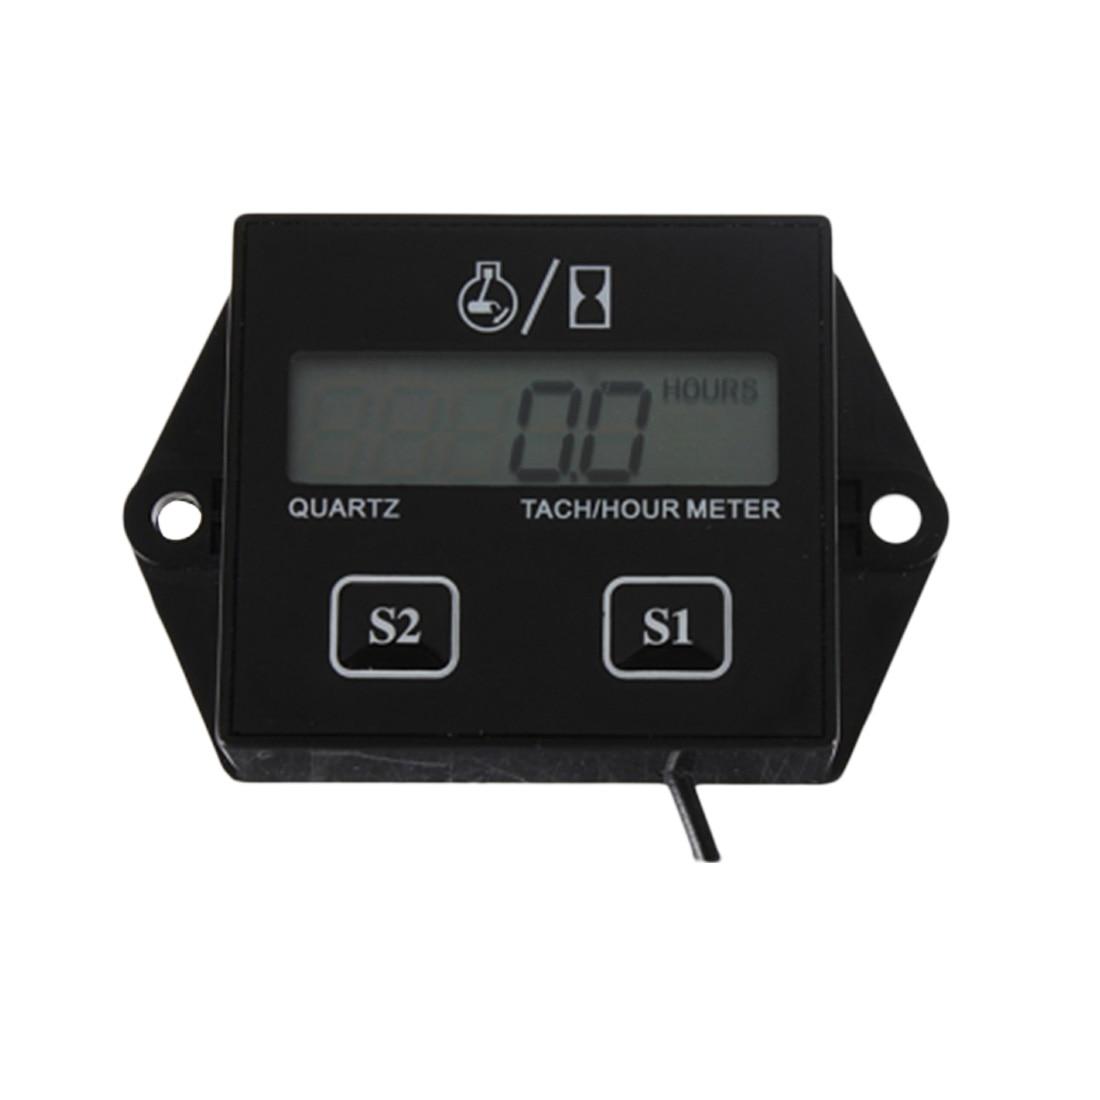 Hot 1pc High Quality Digital Engine Tech Hour Meter Tachometer Gauge Inductive For Motorcycle Motor Stroke Engine Spark цена